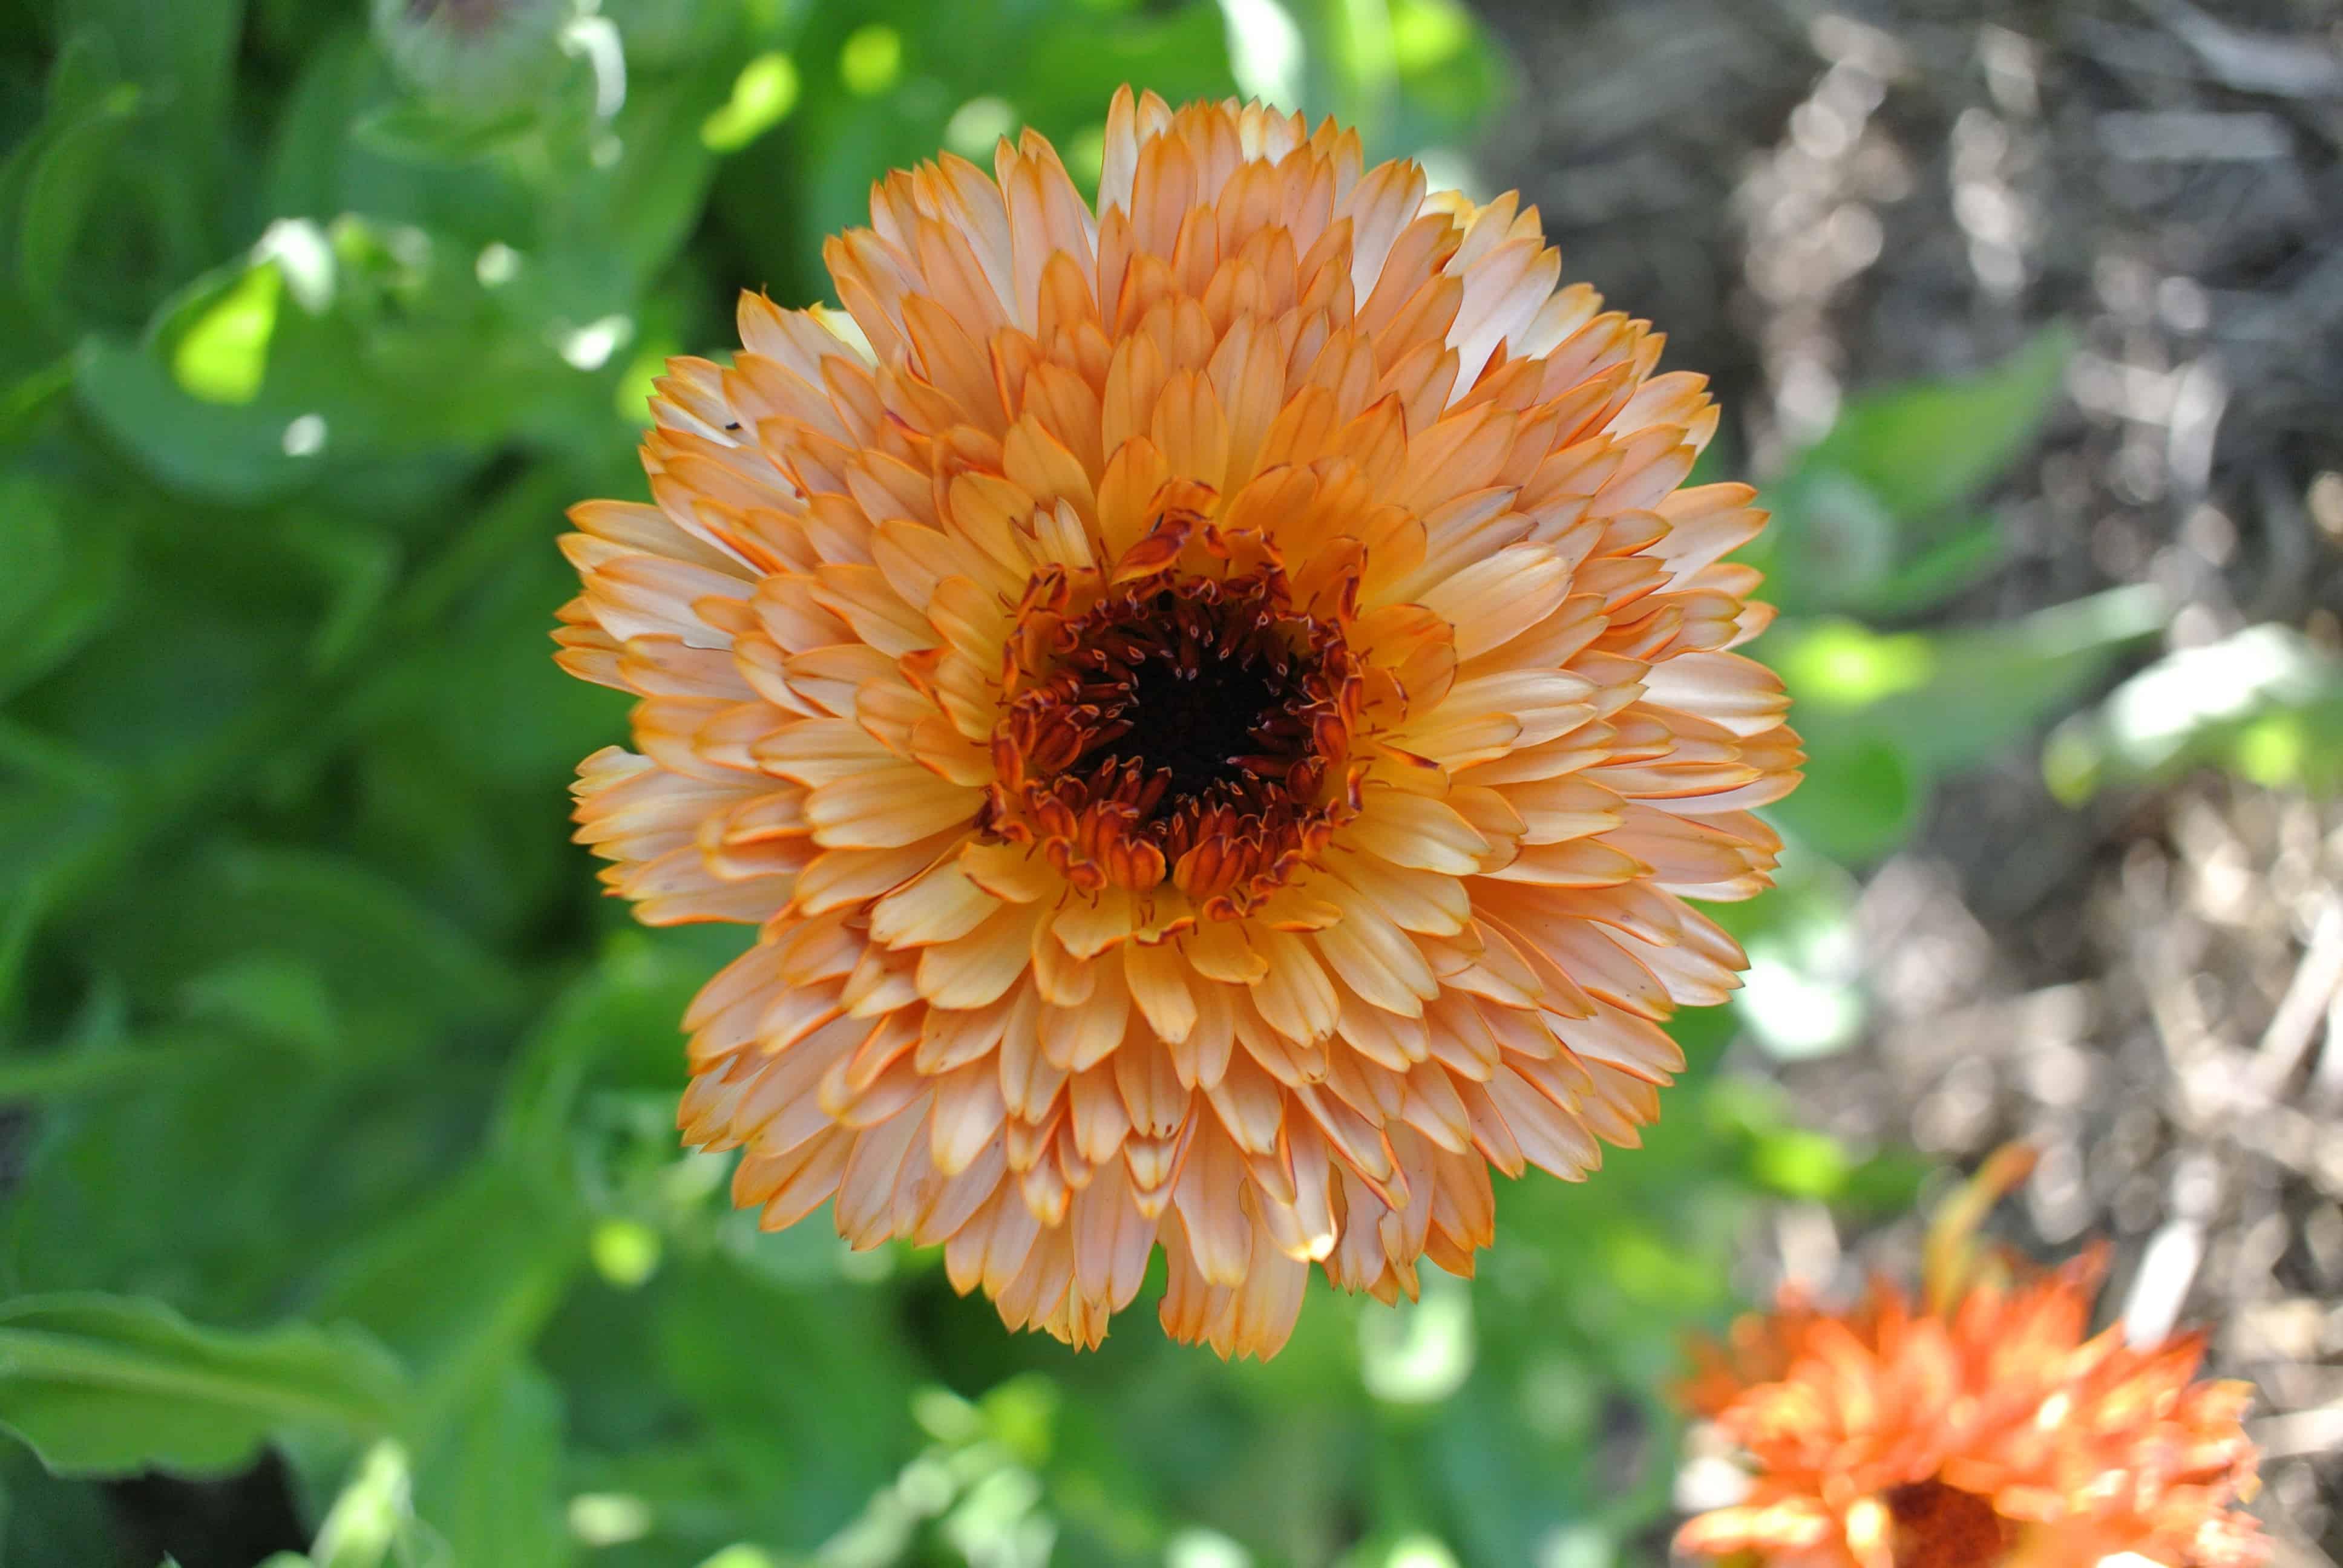 Growing Harvesting And Drying Calendula Flowers